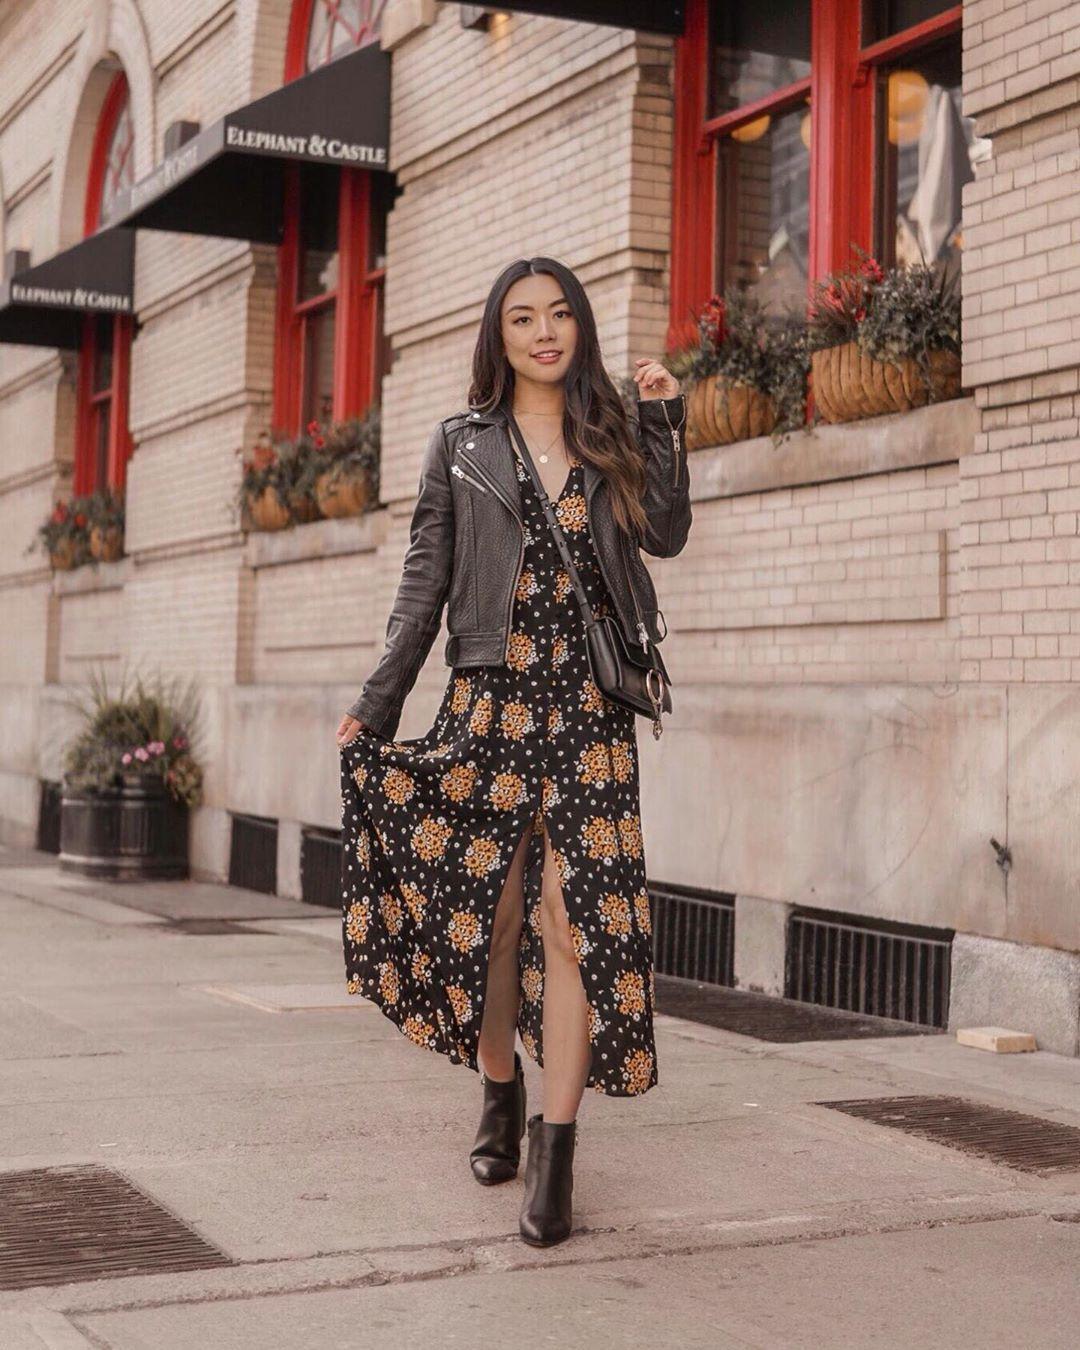 dress floral dress maxi dress black dress slit dress ankle boots black boots black leather jacket black bag